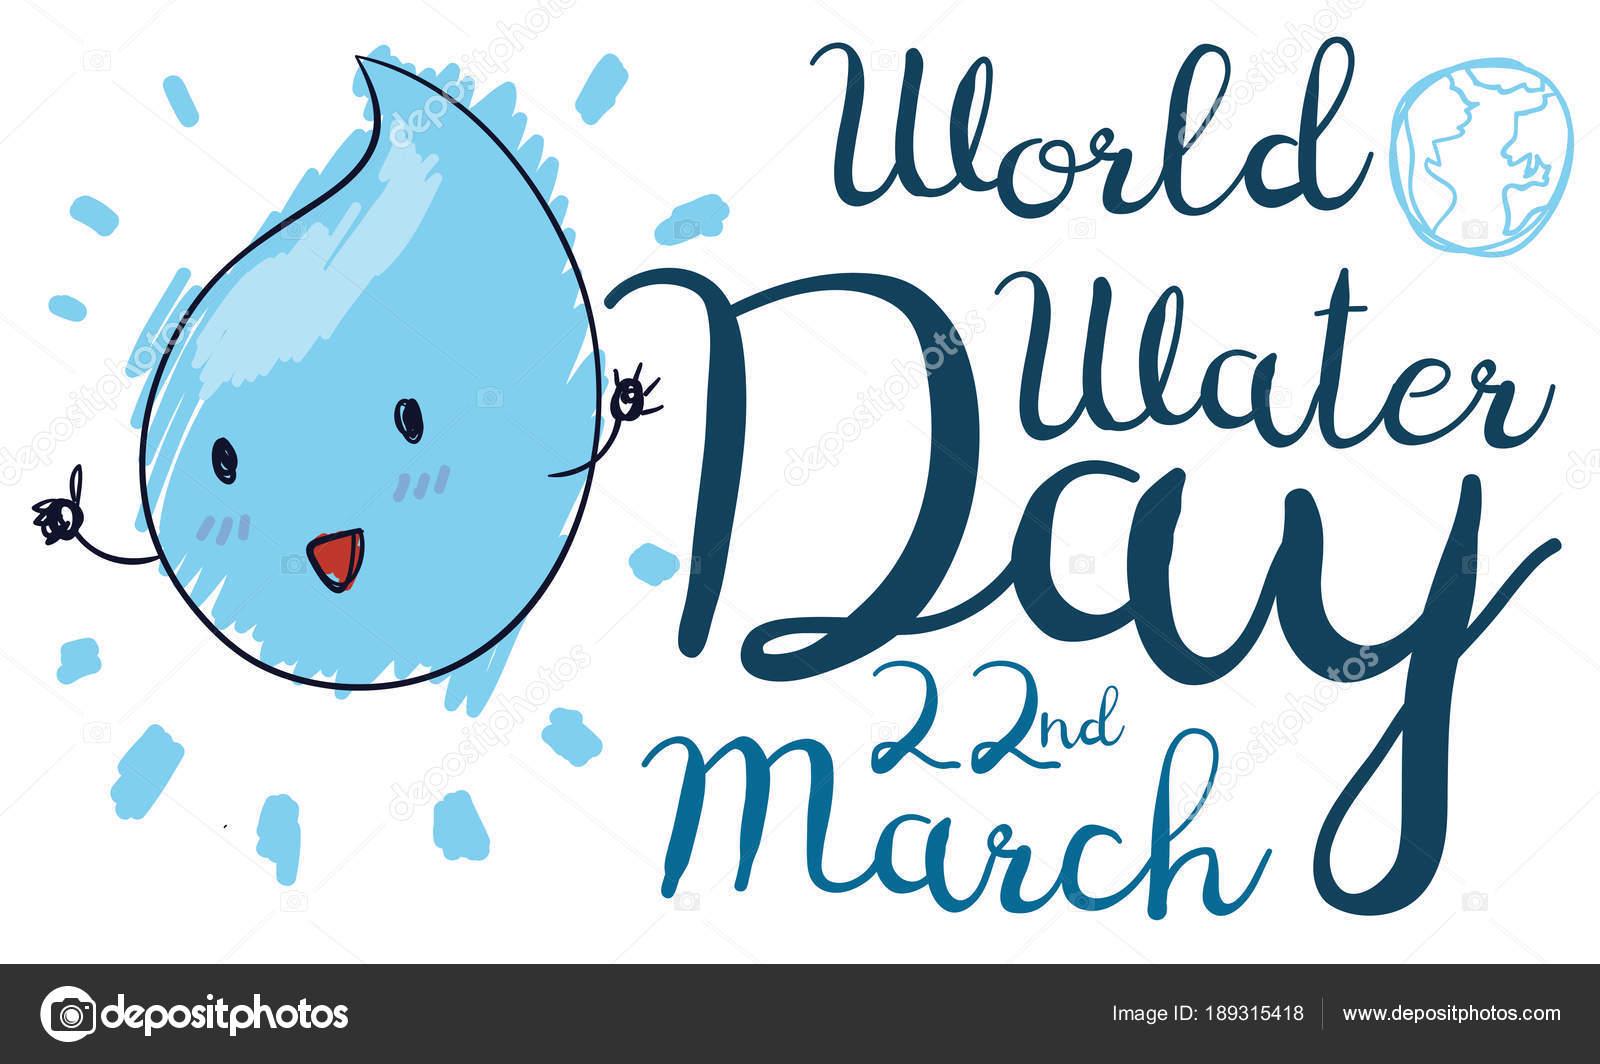 Linda Caída En Doodle Dibujo Para Celebración De Día Mundial Agua